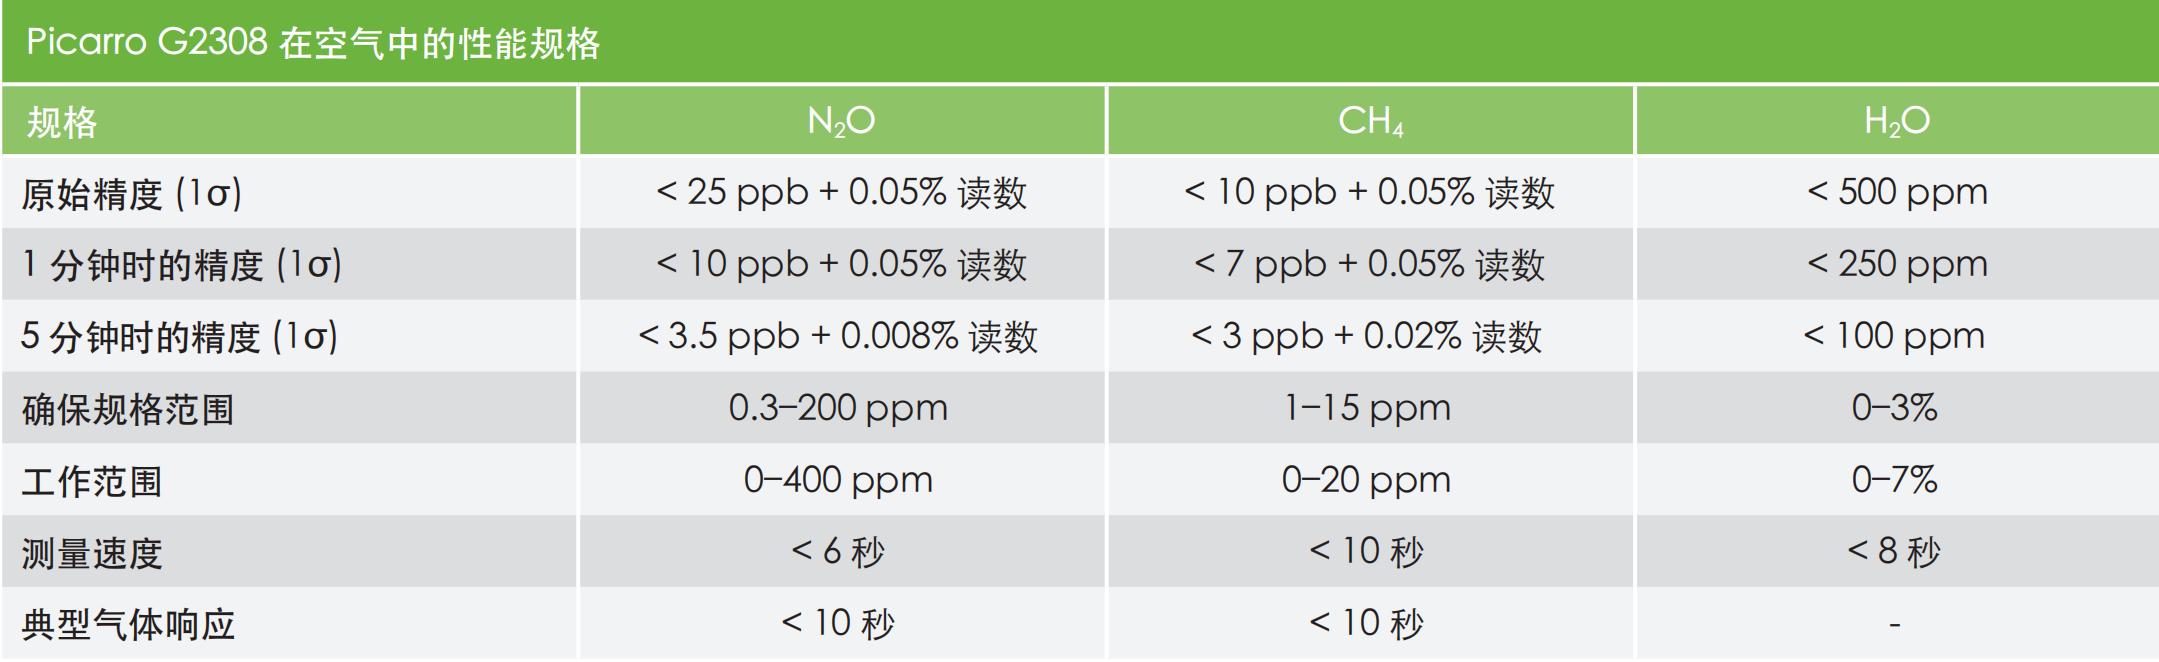 Picarro_G2308 Chinese Datasheet_00.png